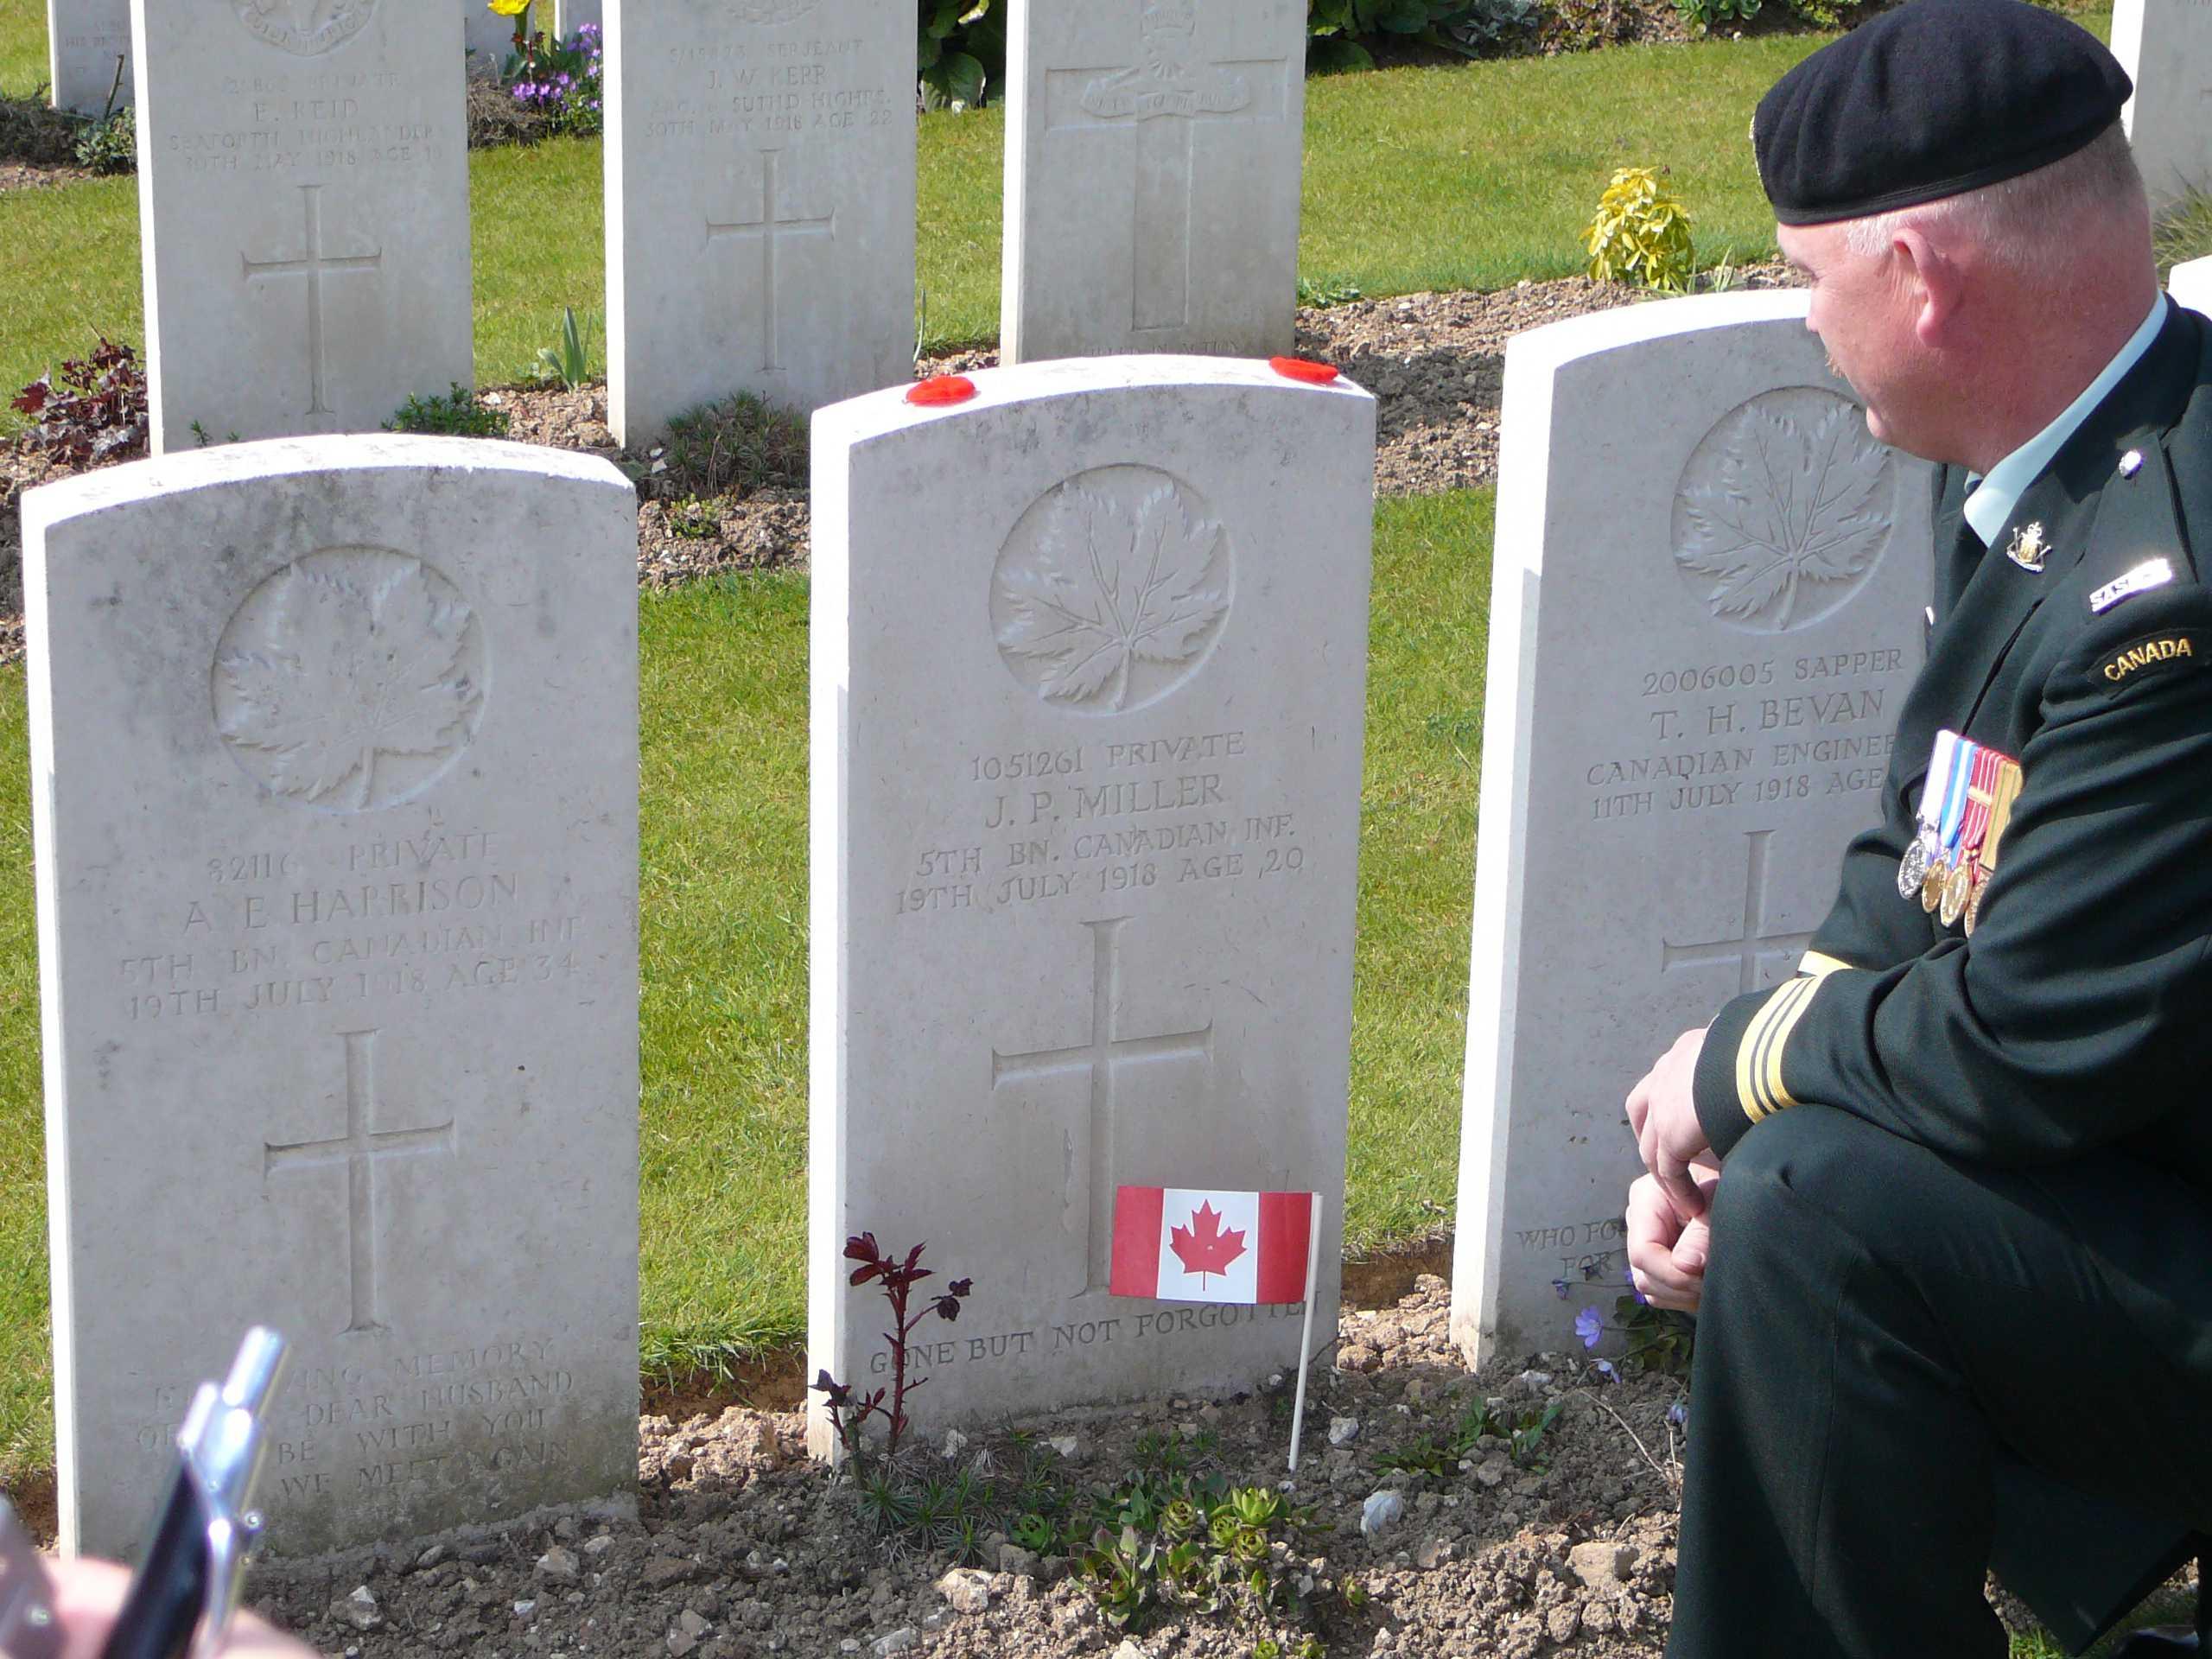 Grave Marker– Taken while visiting the grave April 2007